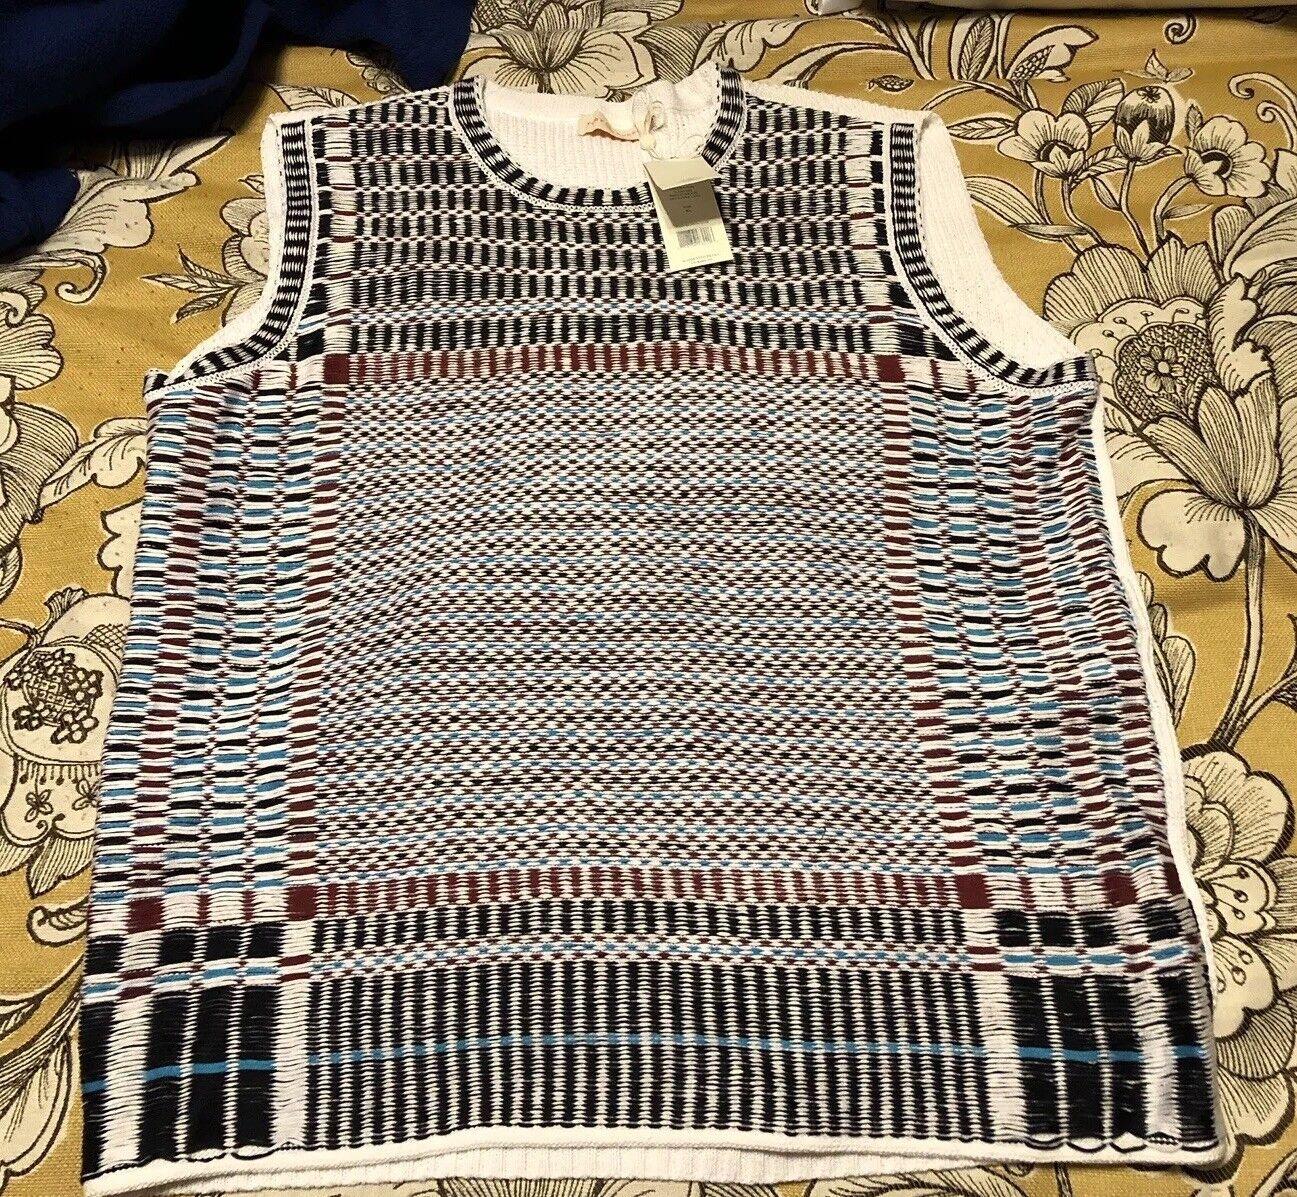 Tory Burch Sz XL Basket Weave Jacquard Floating Sleeveless Sweater